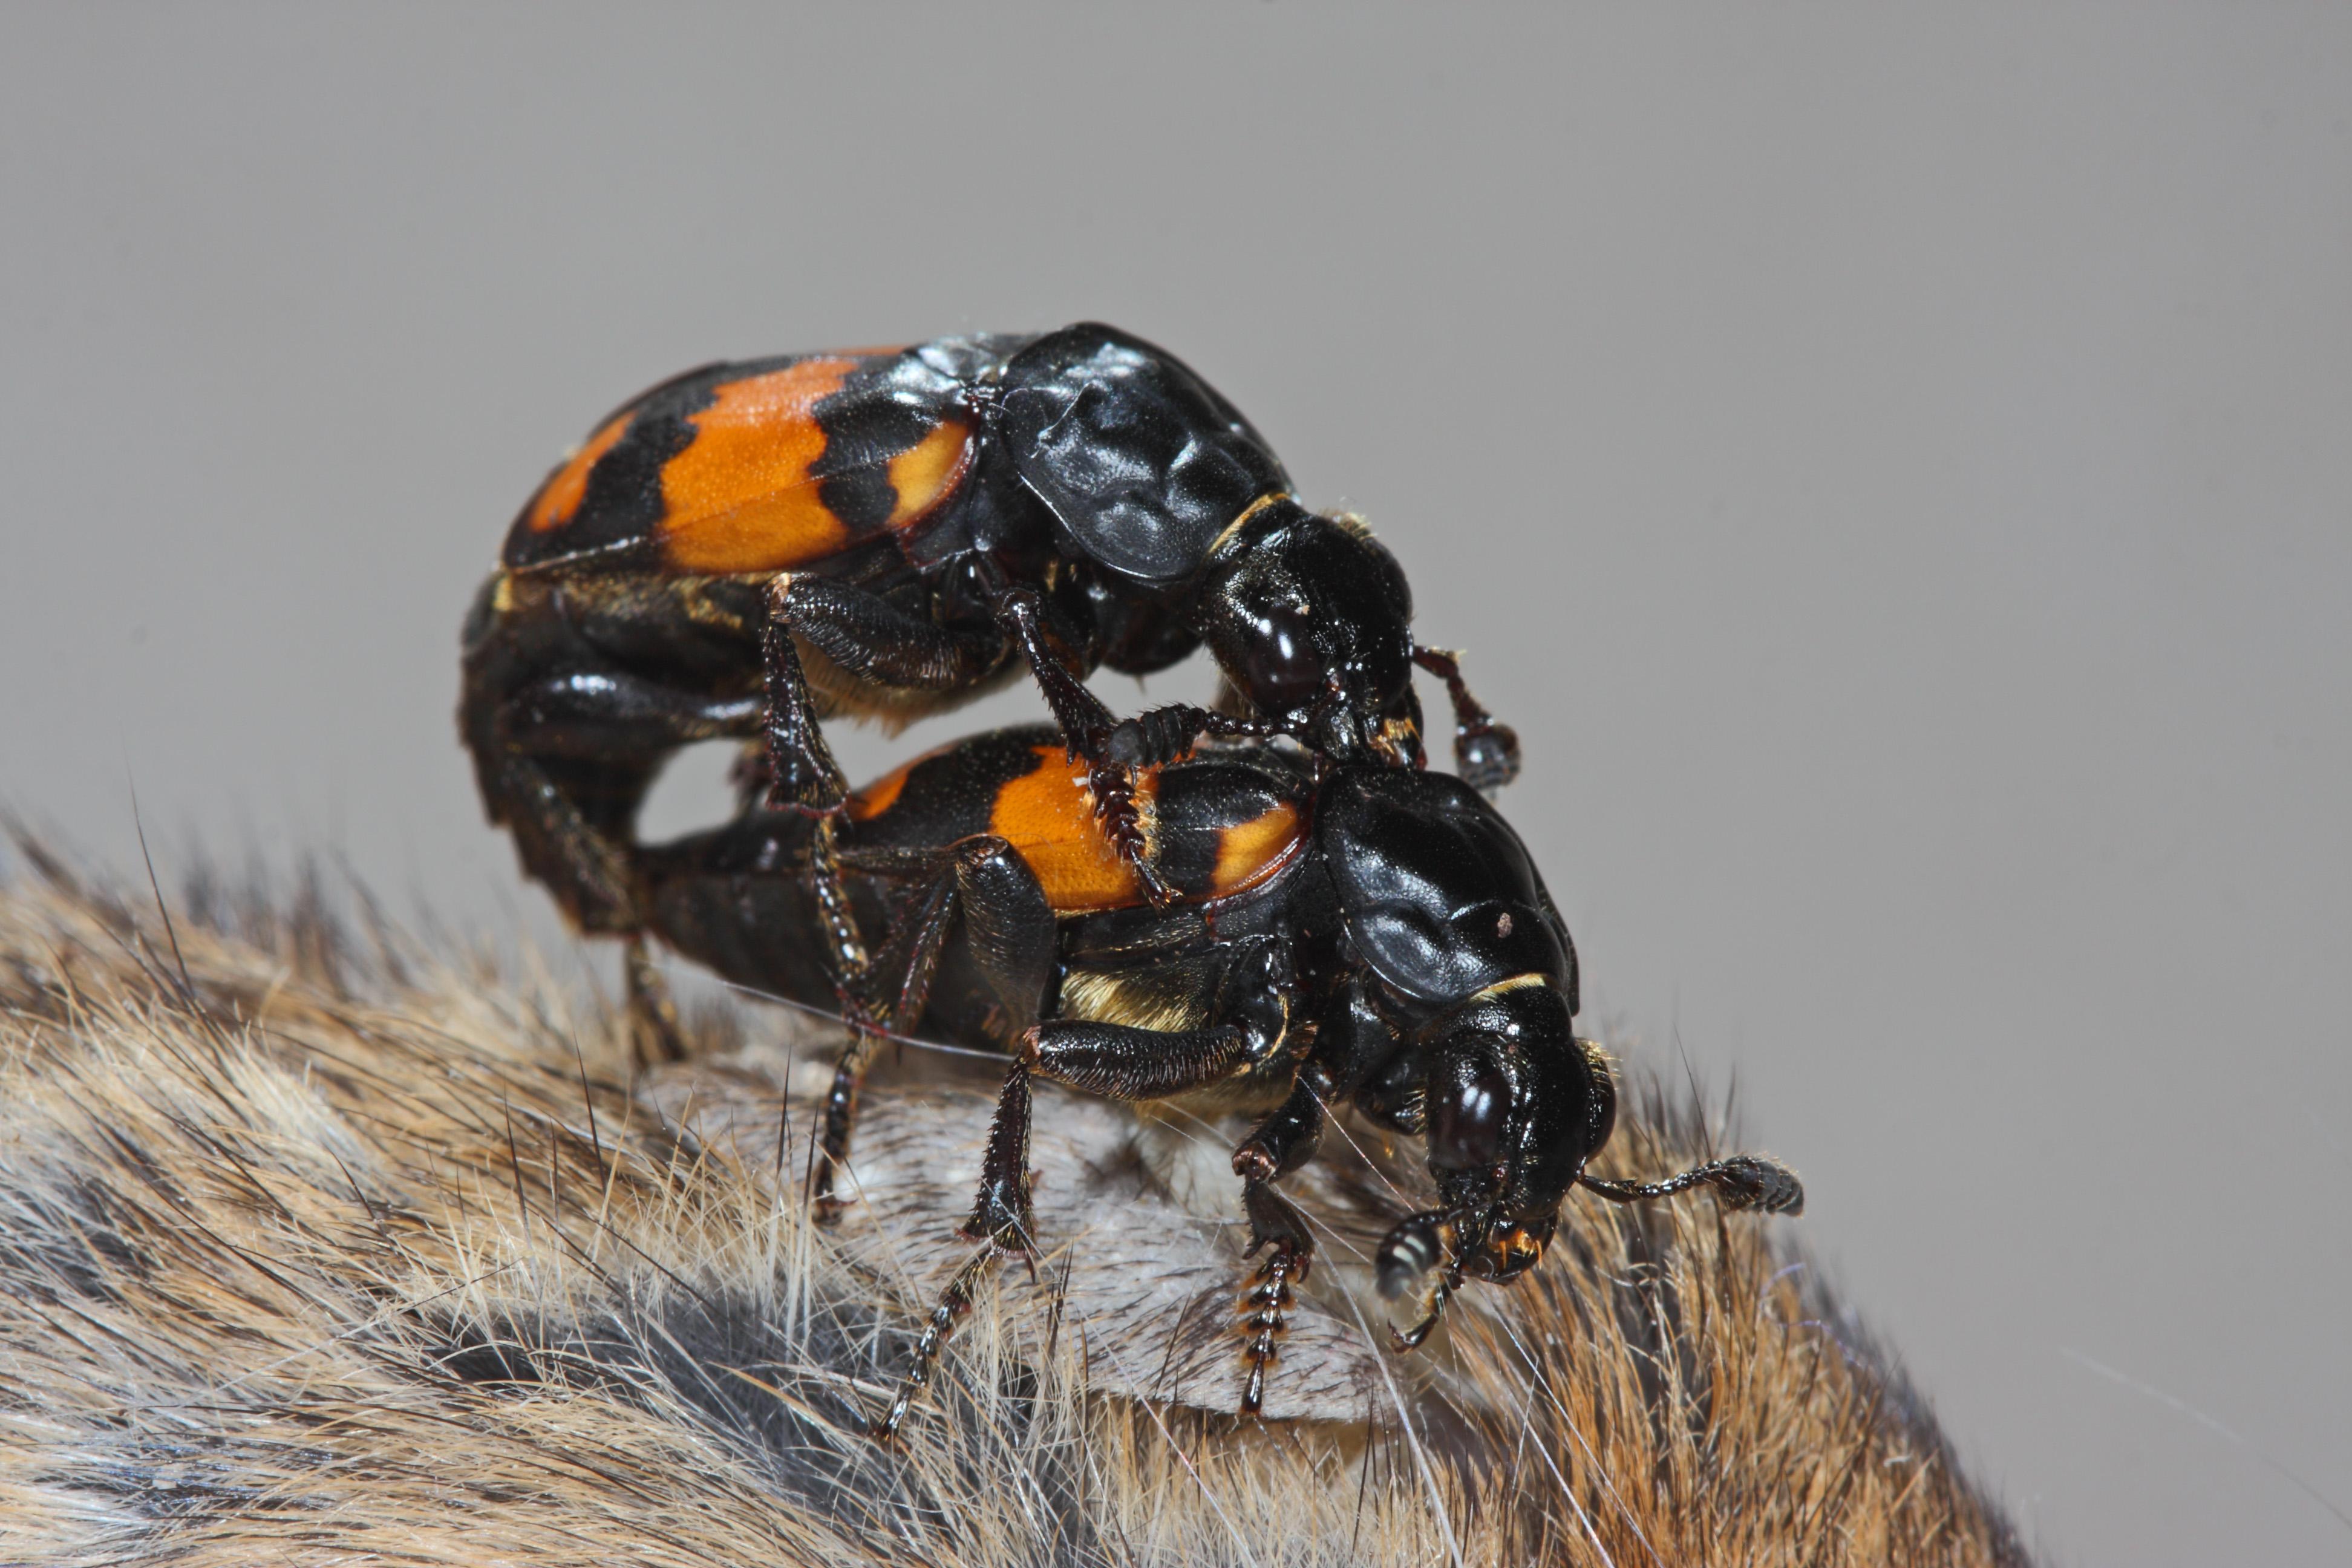 This female beetle uses unsexy pheromones to calm horny dudes